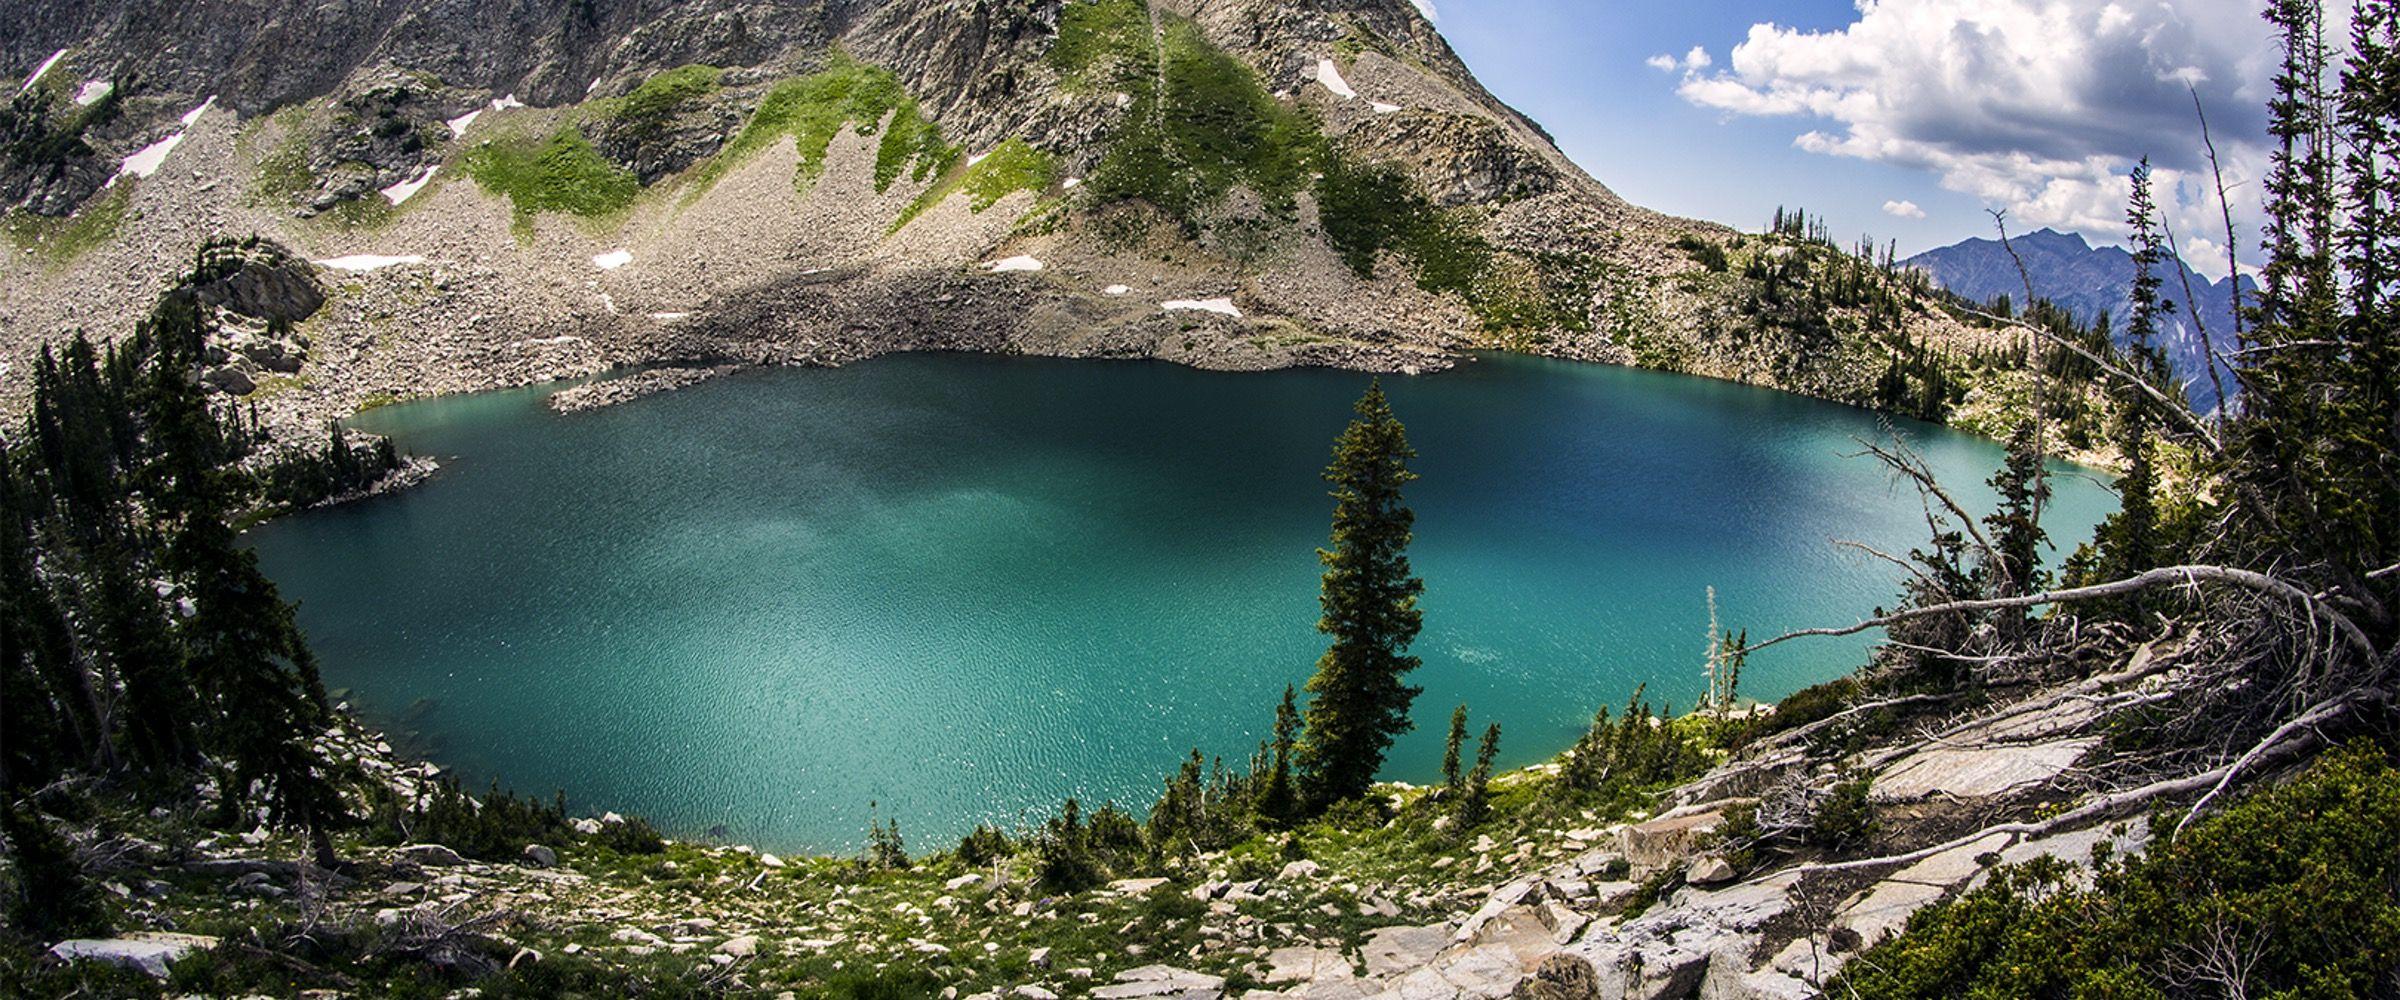 Salt Lake City S Top 6 Spring Hikes Salt Lake City Utah Utah